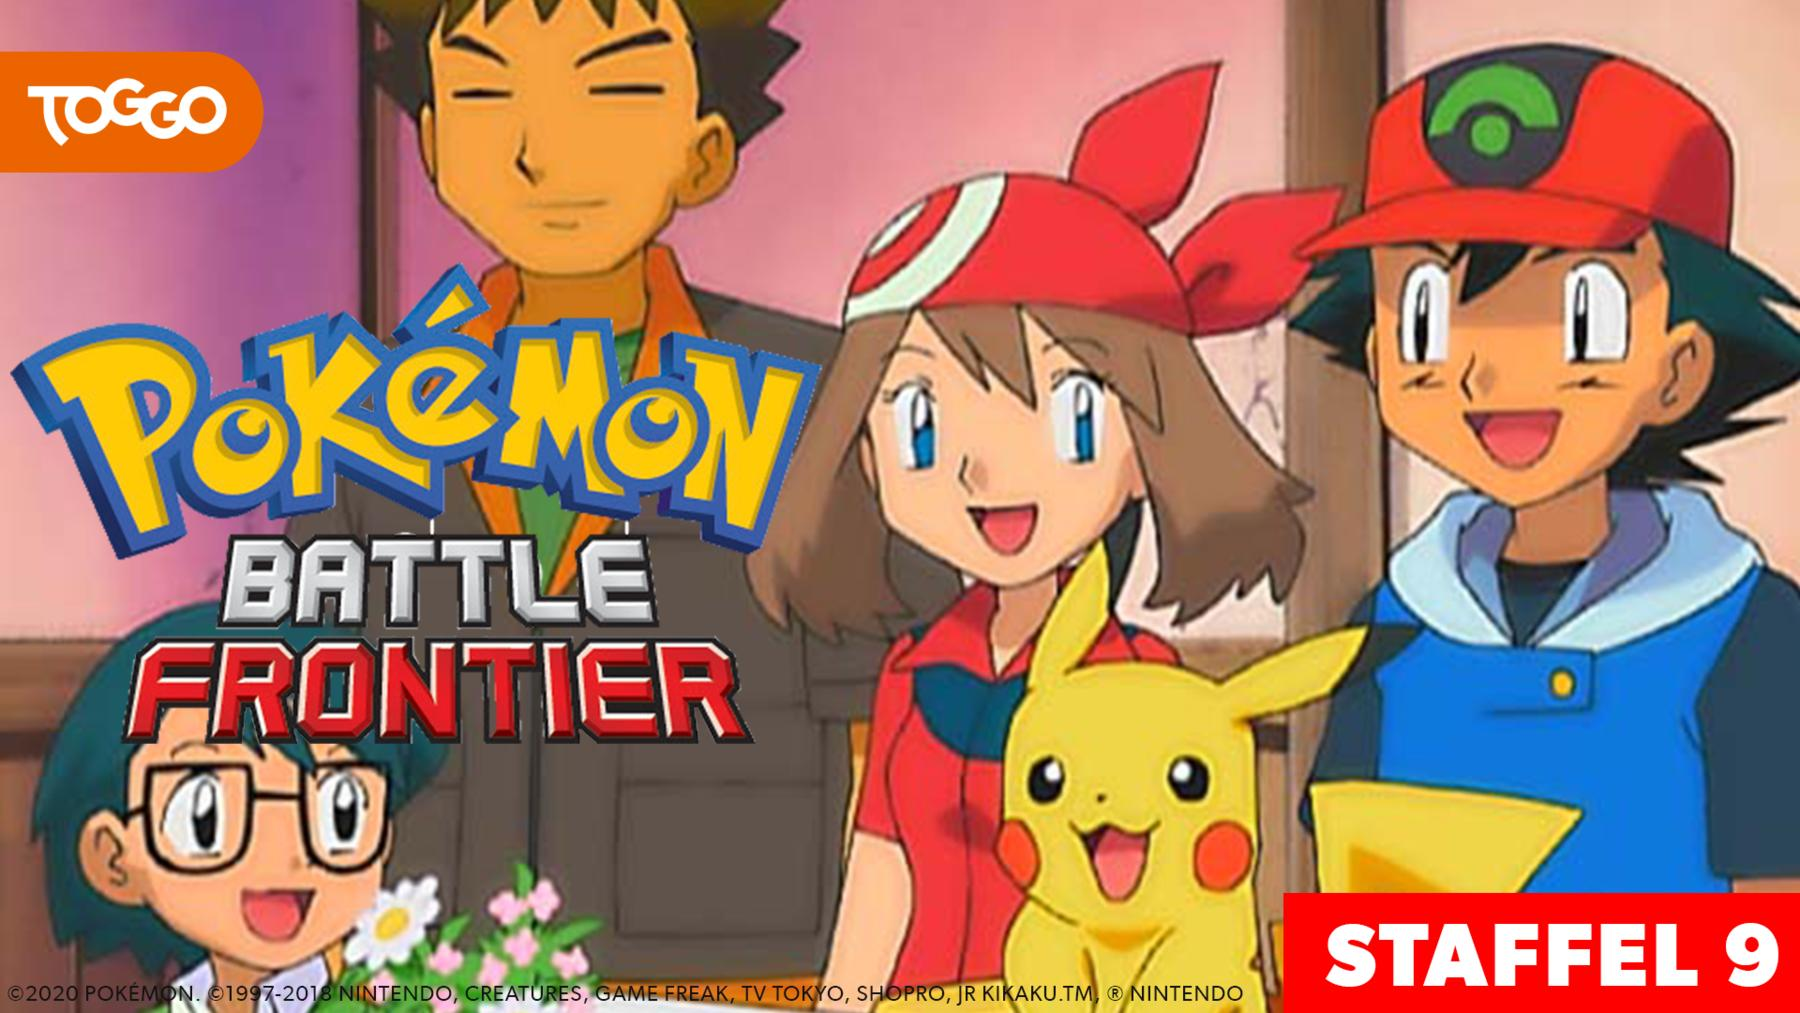 Pokémon: Battle Frontier / 9